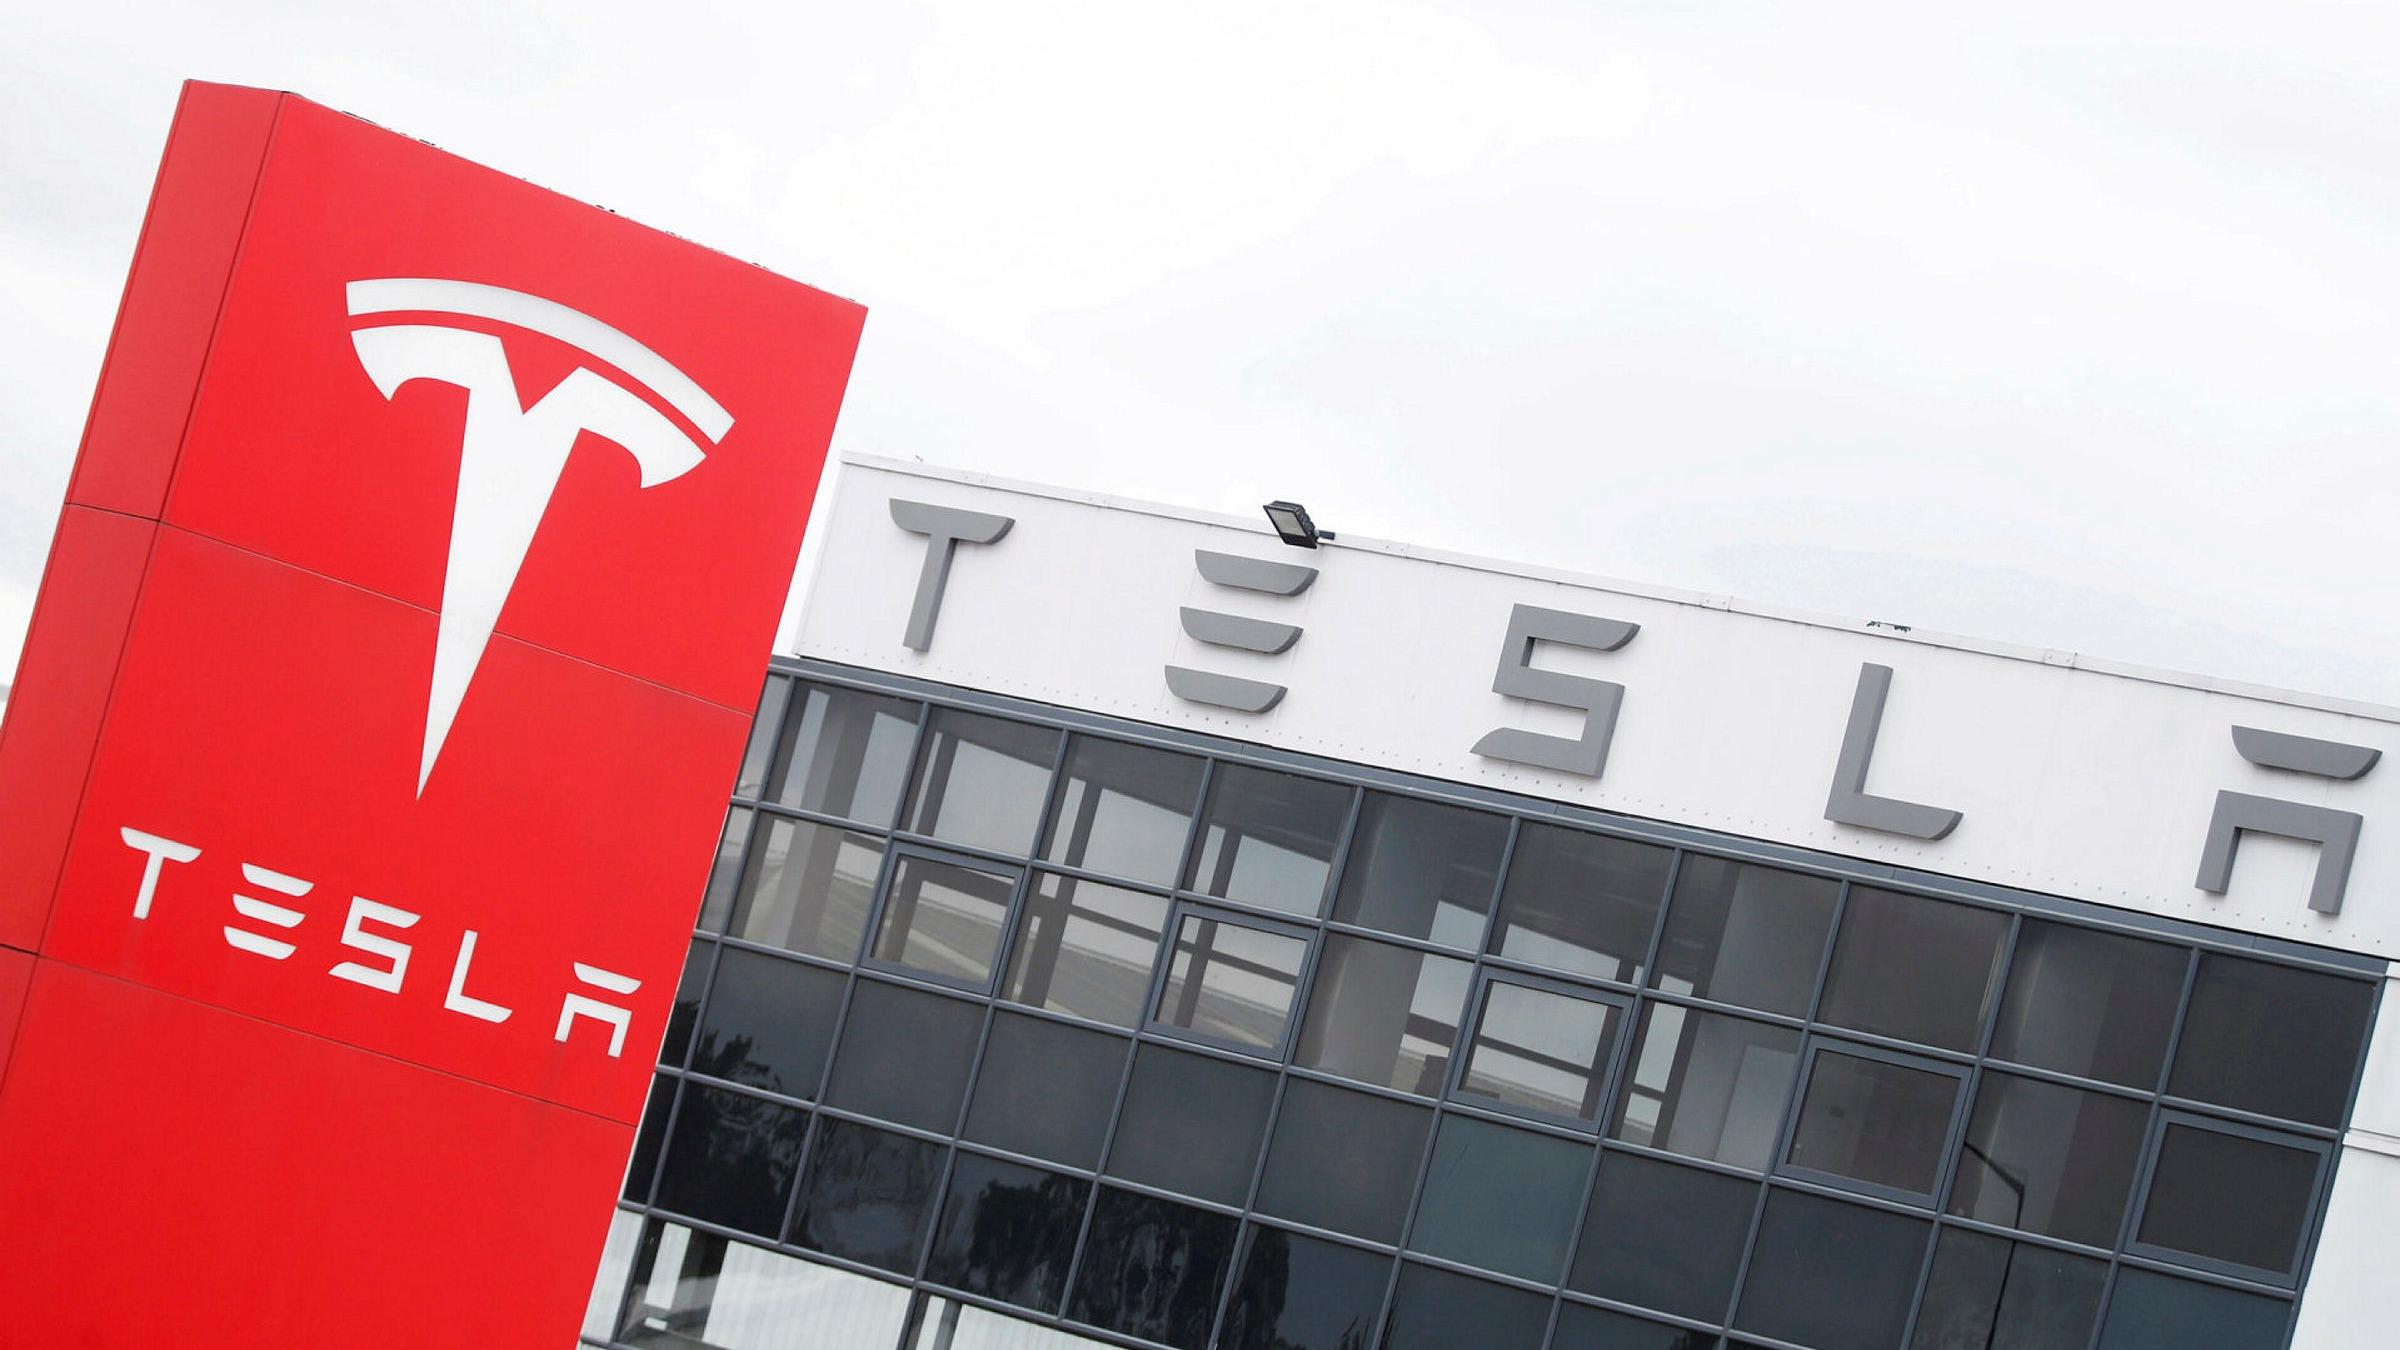 ft.com - Patrick McGee in San Francisco and Mamta Badkar in New York - Tesla hits $1tn in market value